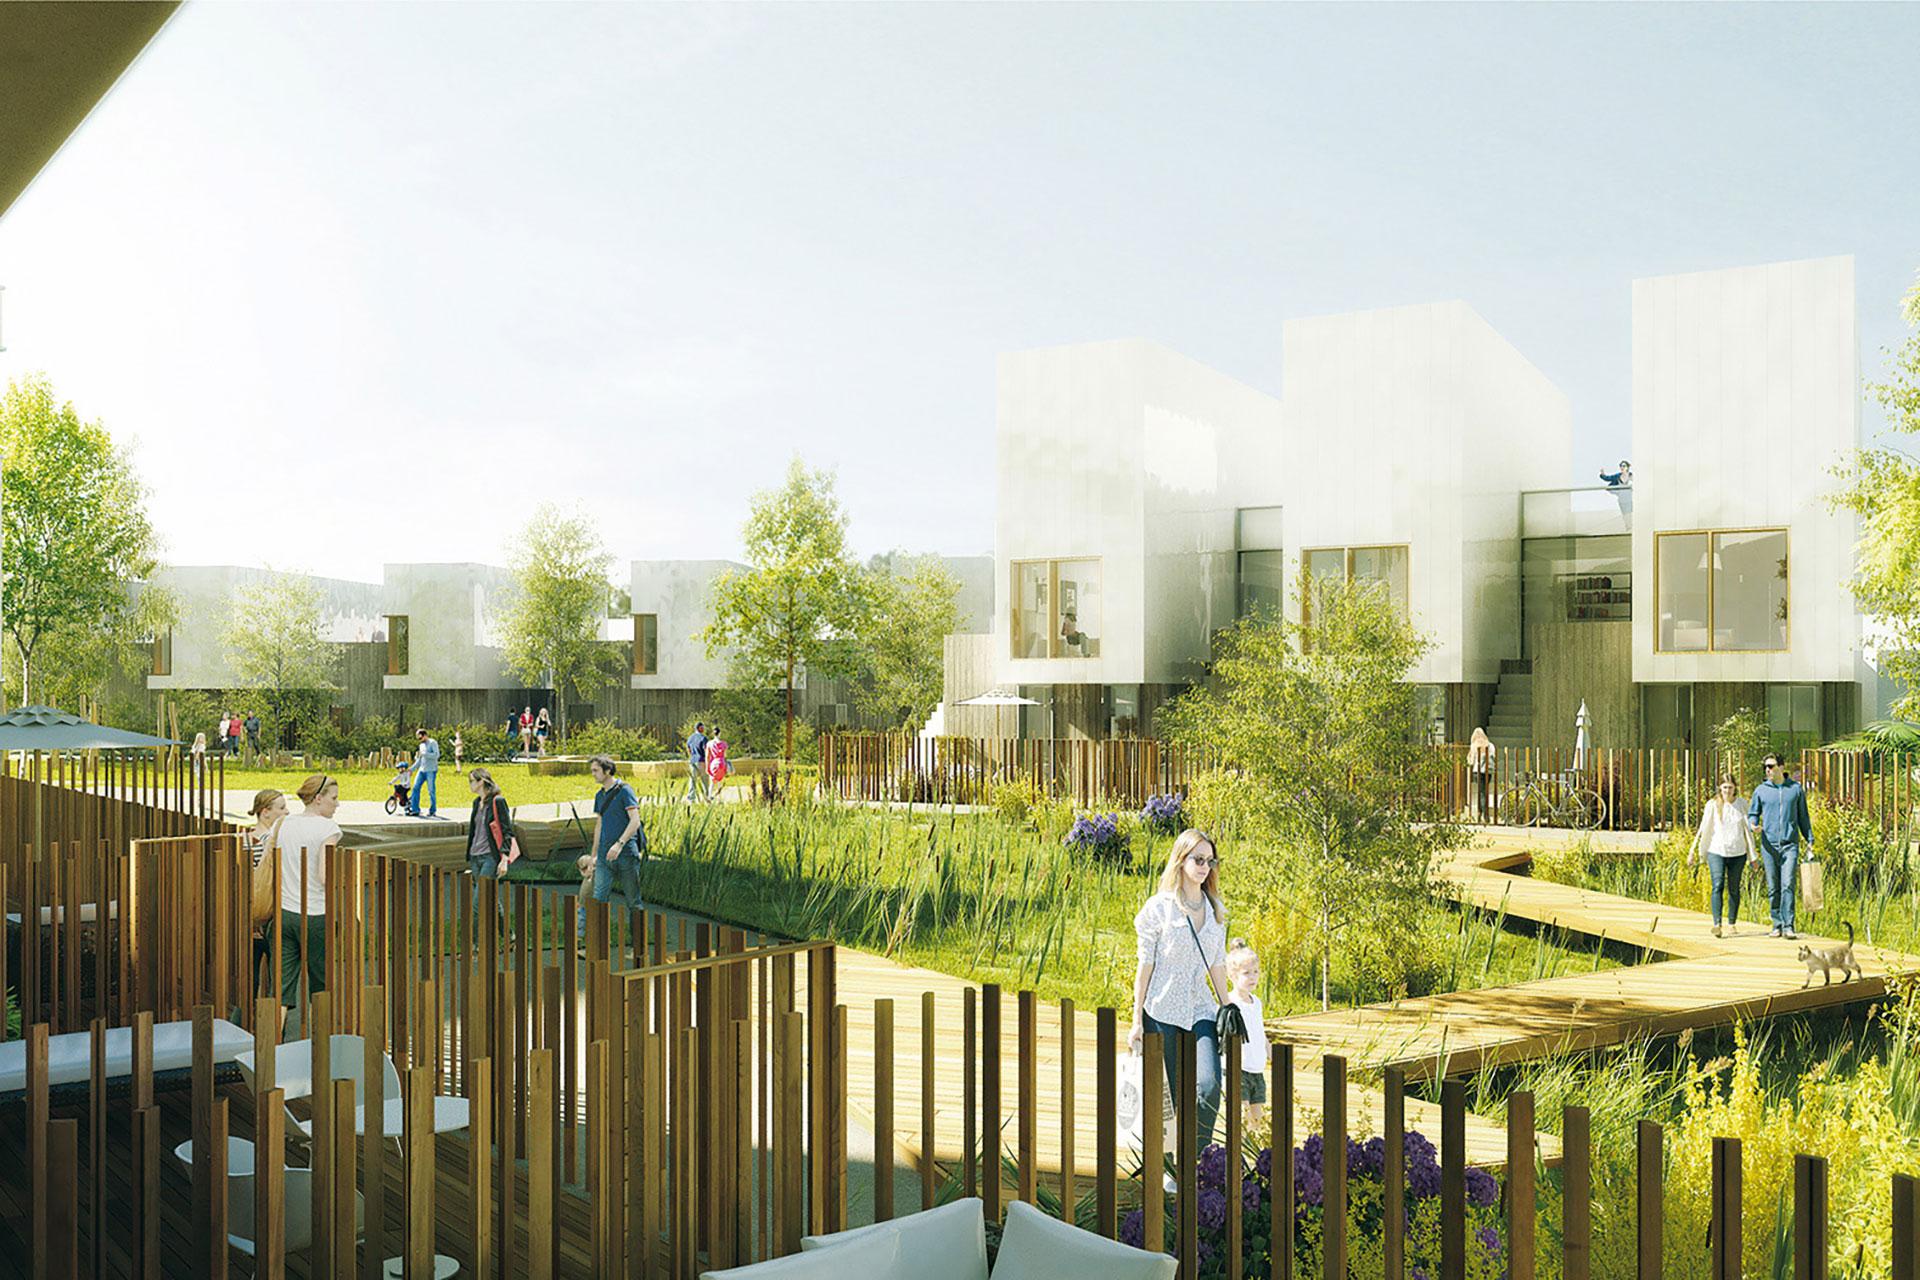 saa-architectes_urbanisme_etudeurbaine_mitrymory